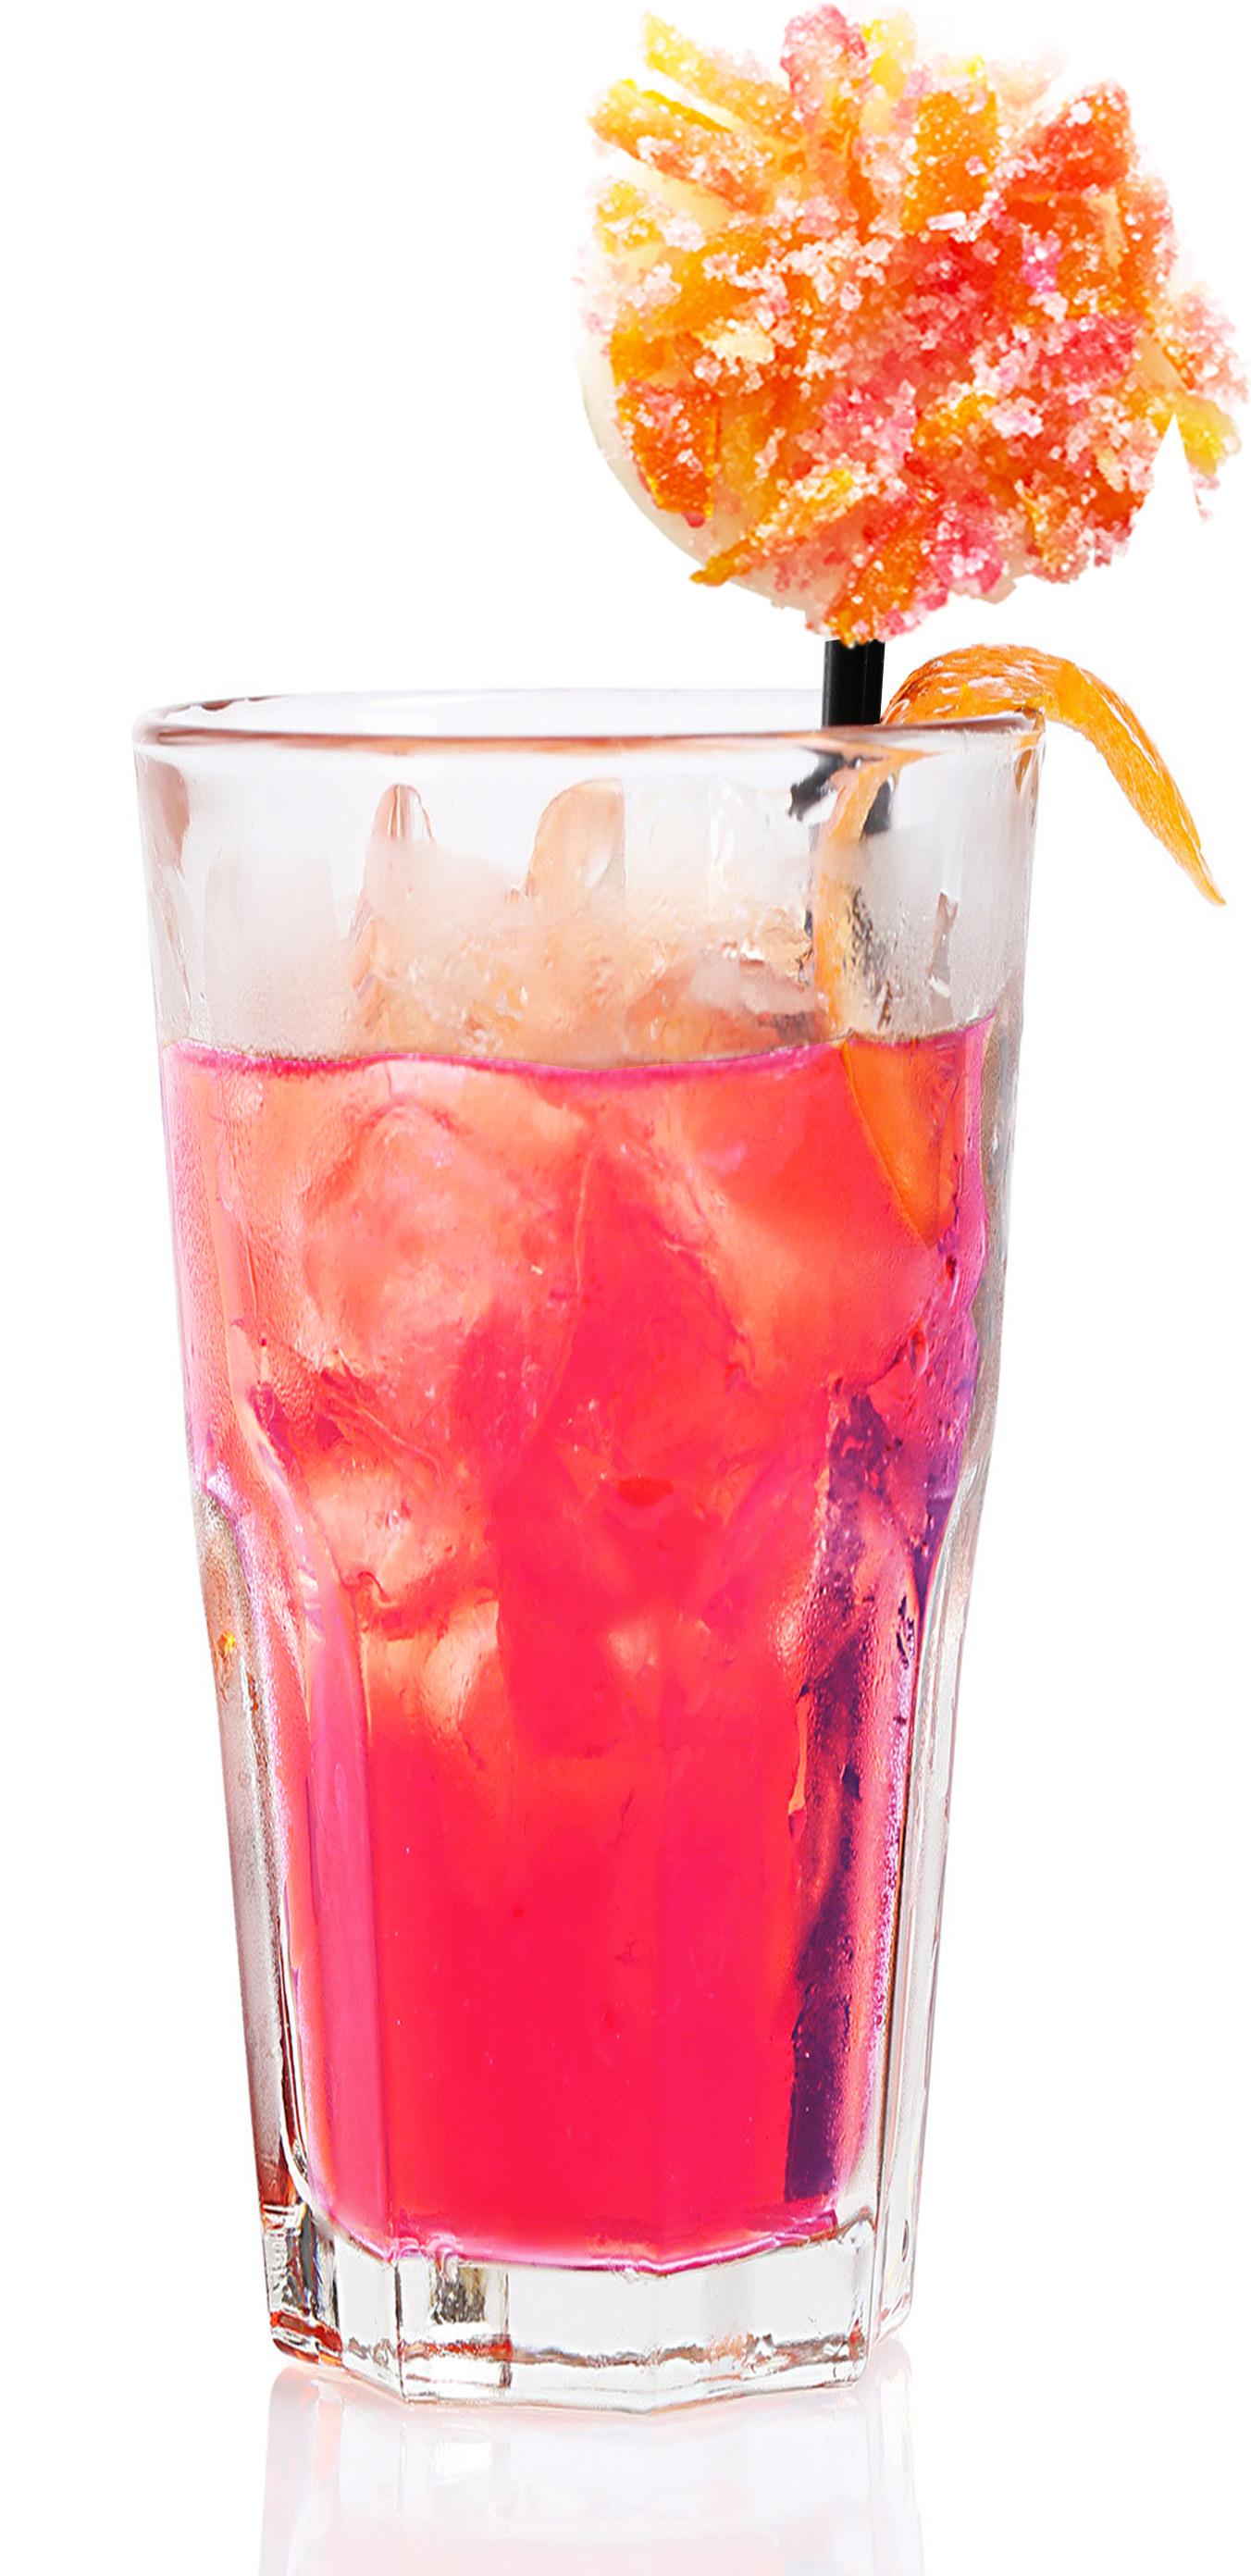 carousel-cocktail-in-season-spring-citrus-4.jpg